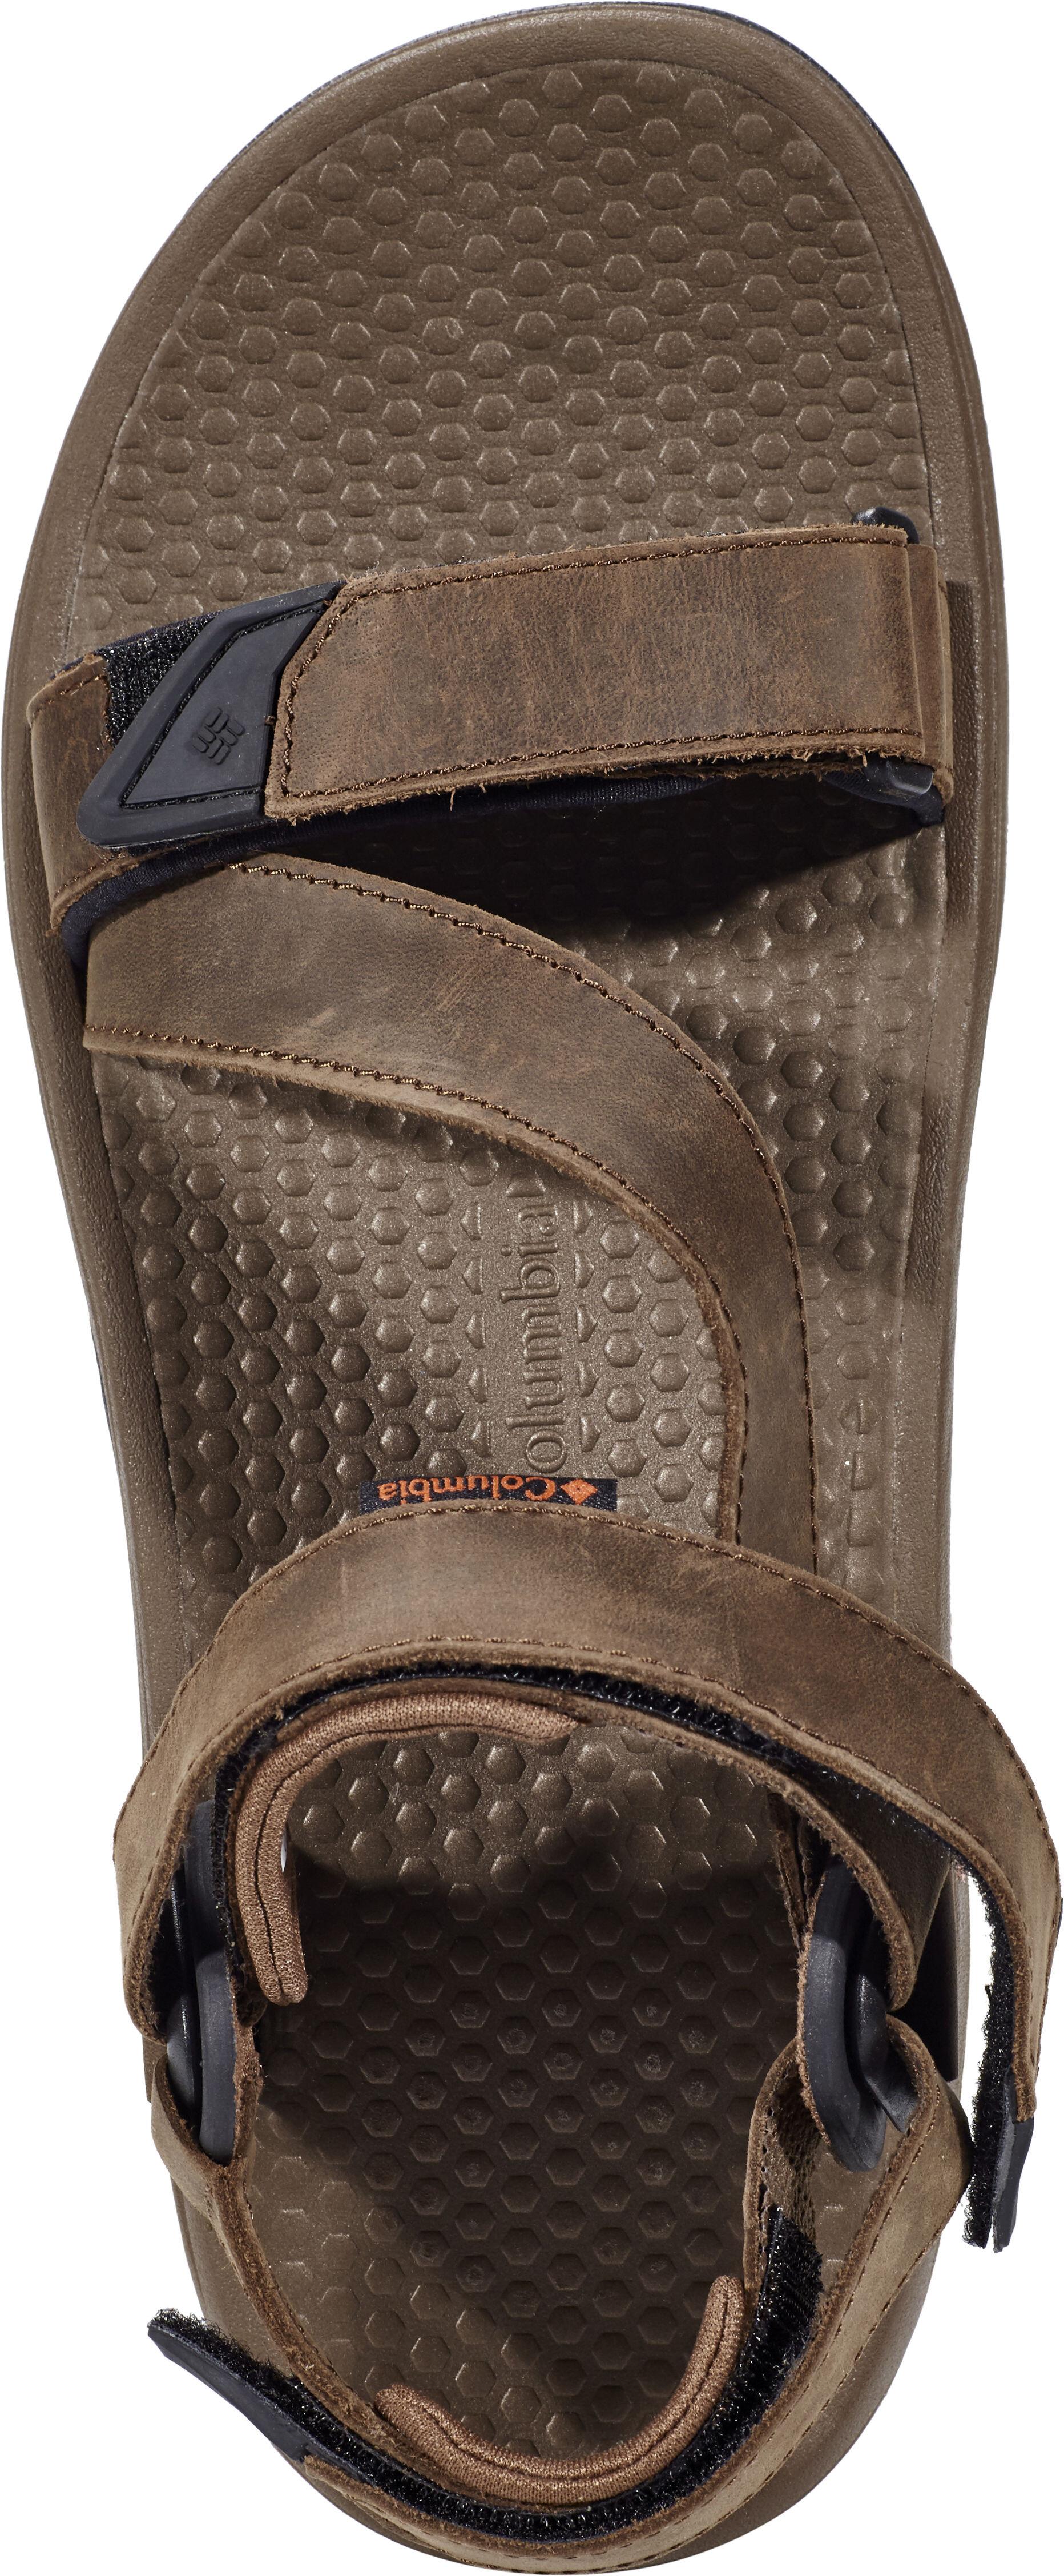 4b9eaf524186 Columbia Big Water Leather - Sandales Homme - marron sur CAMPZ !